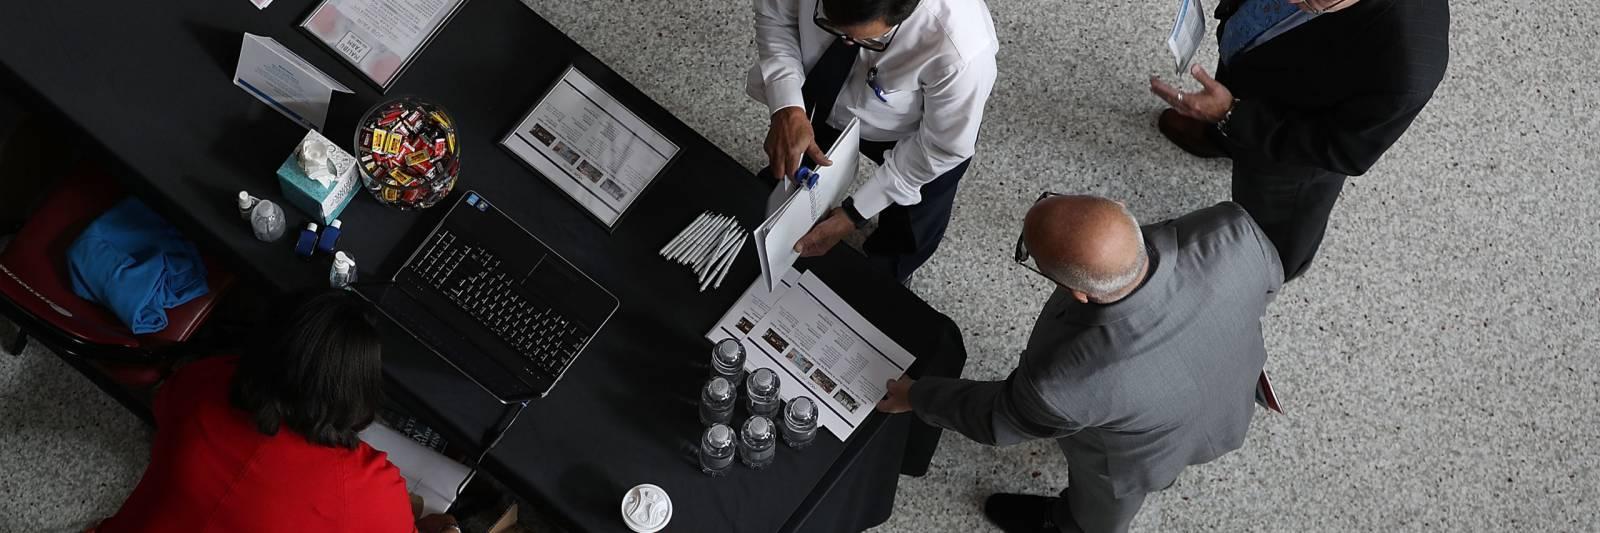 new 'digital trust exchange' removes risks of managing pii of